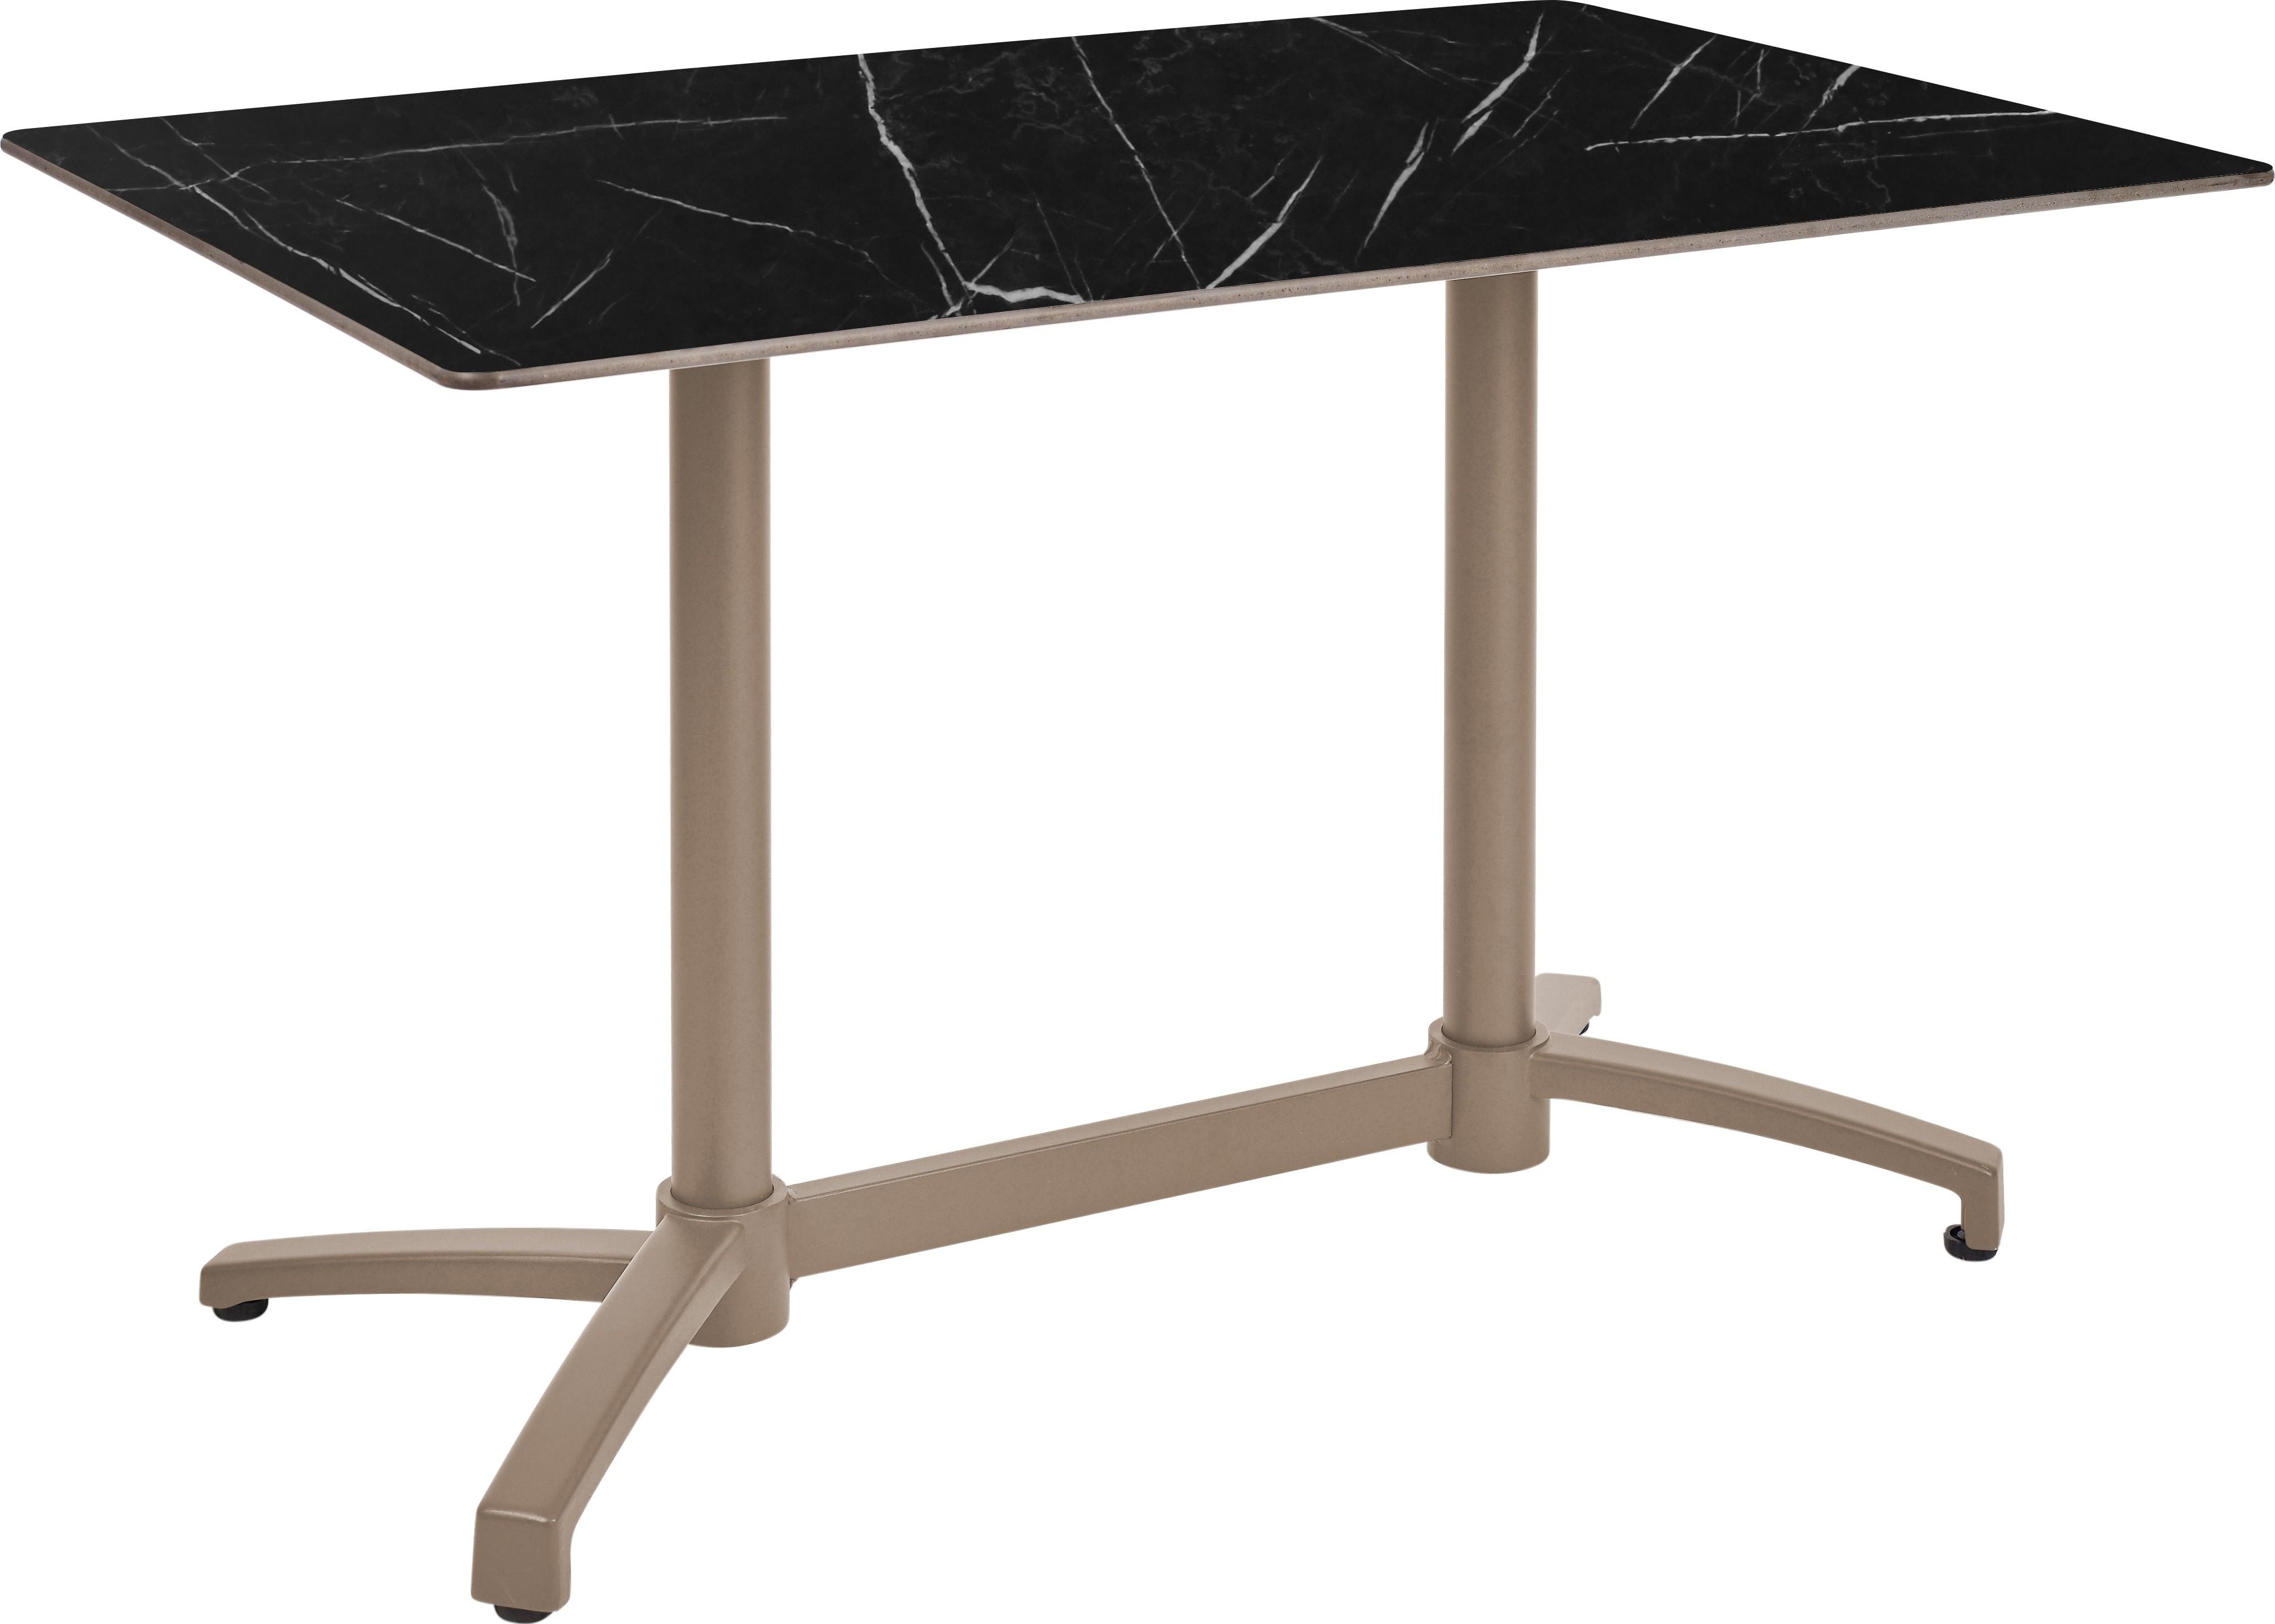 Mesa Ezpeleta abatible Taupe Marrones black marble Aluminio lacado 110x70